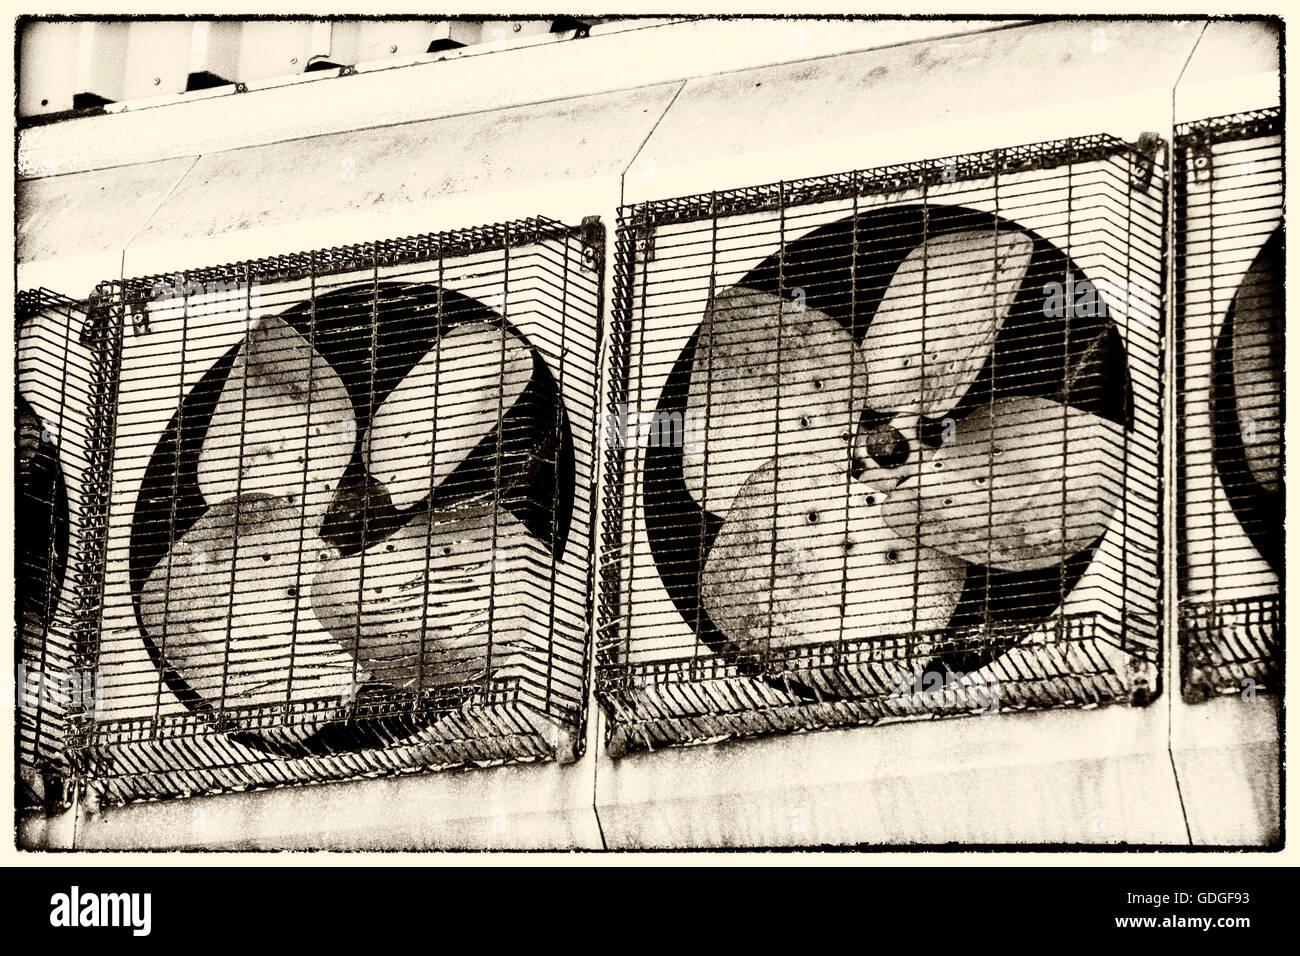 Extractor Fans at the Derelict Torridge Vale Dairy, Torrington, Devon. - NIK Silver Effects Processed. - Stock Image